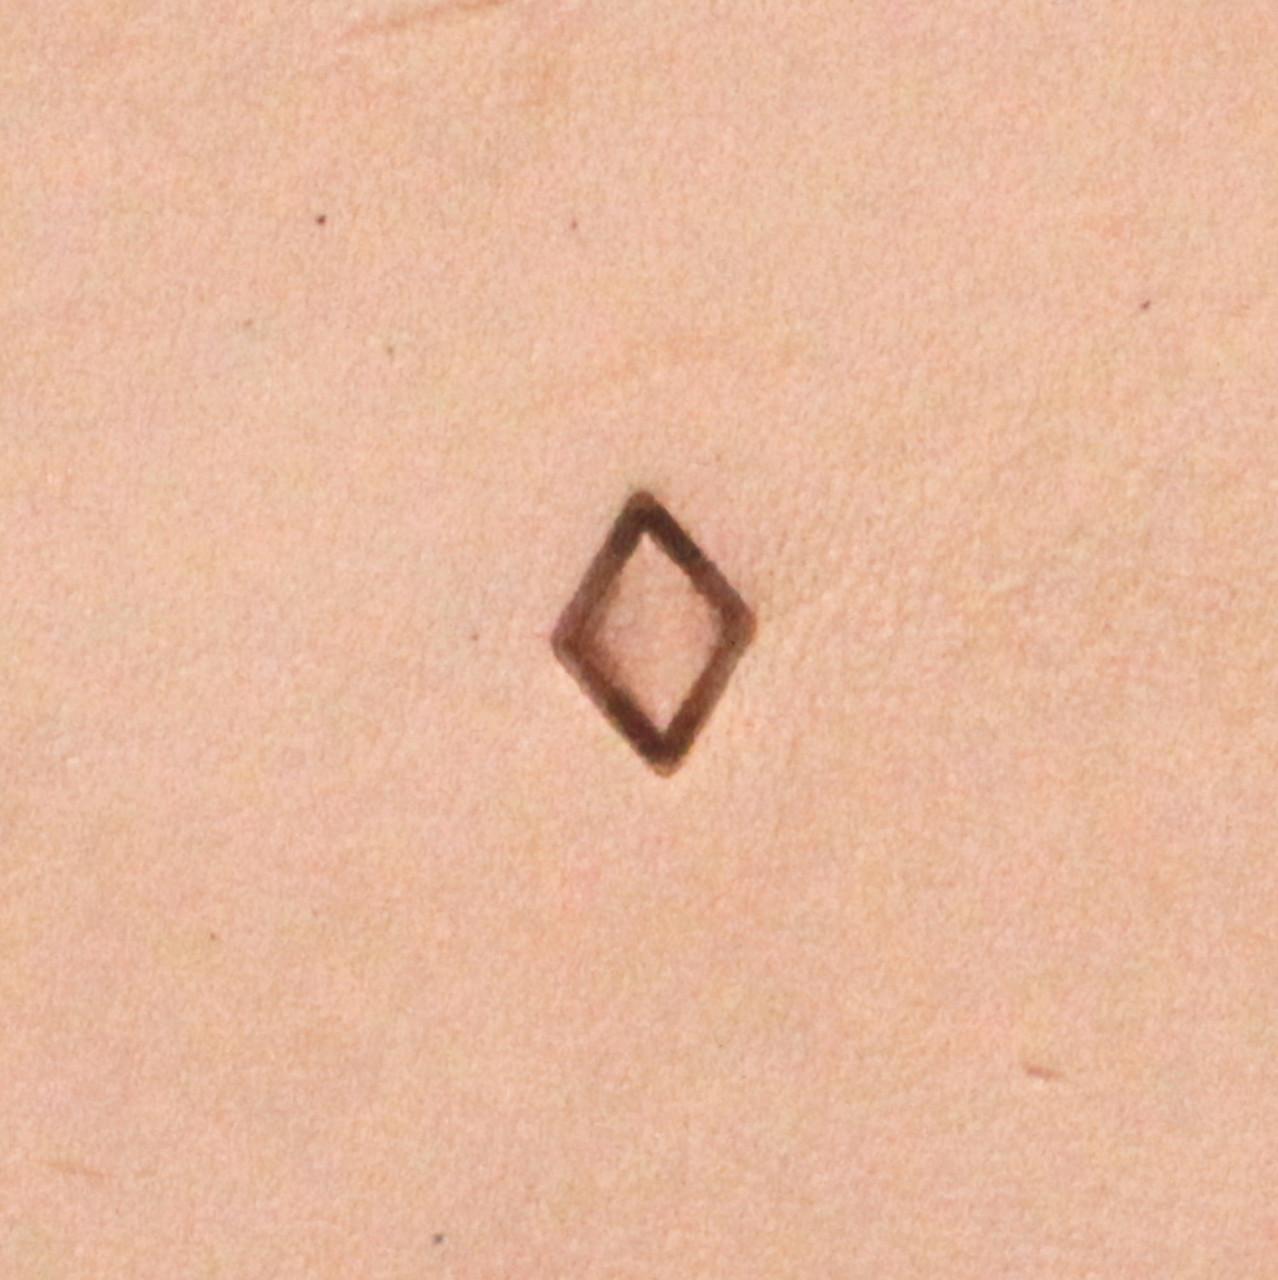 Diamond Geometric Stamp Tool S723 Impression